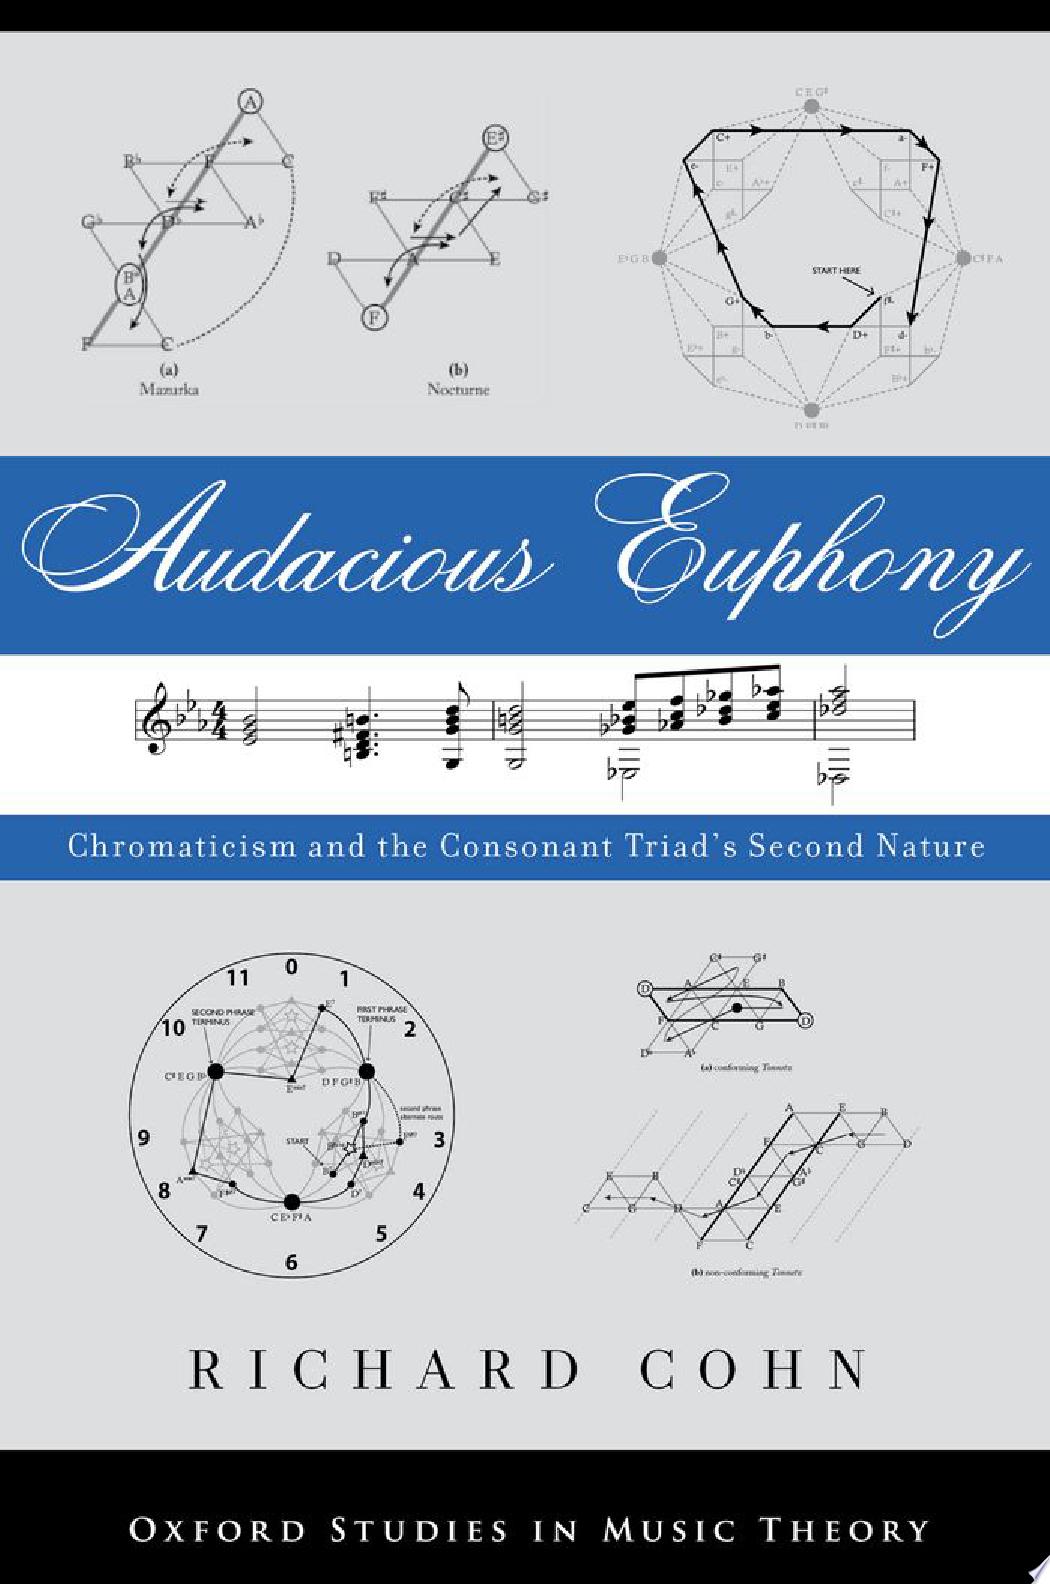 Audacious Euphony